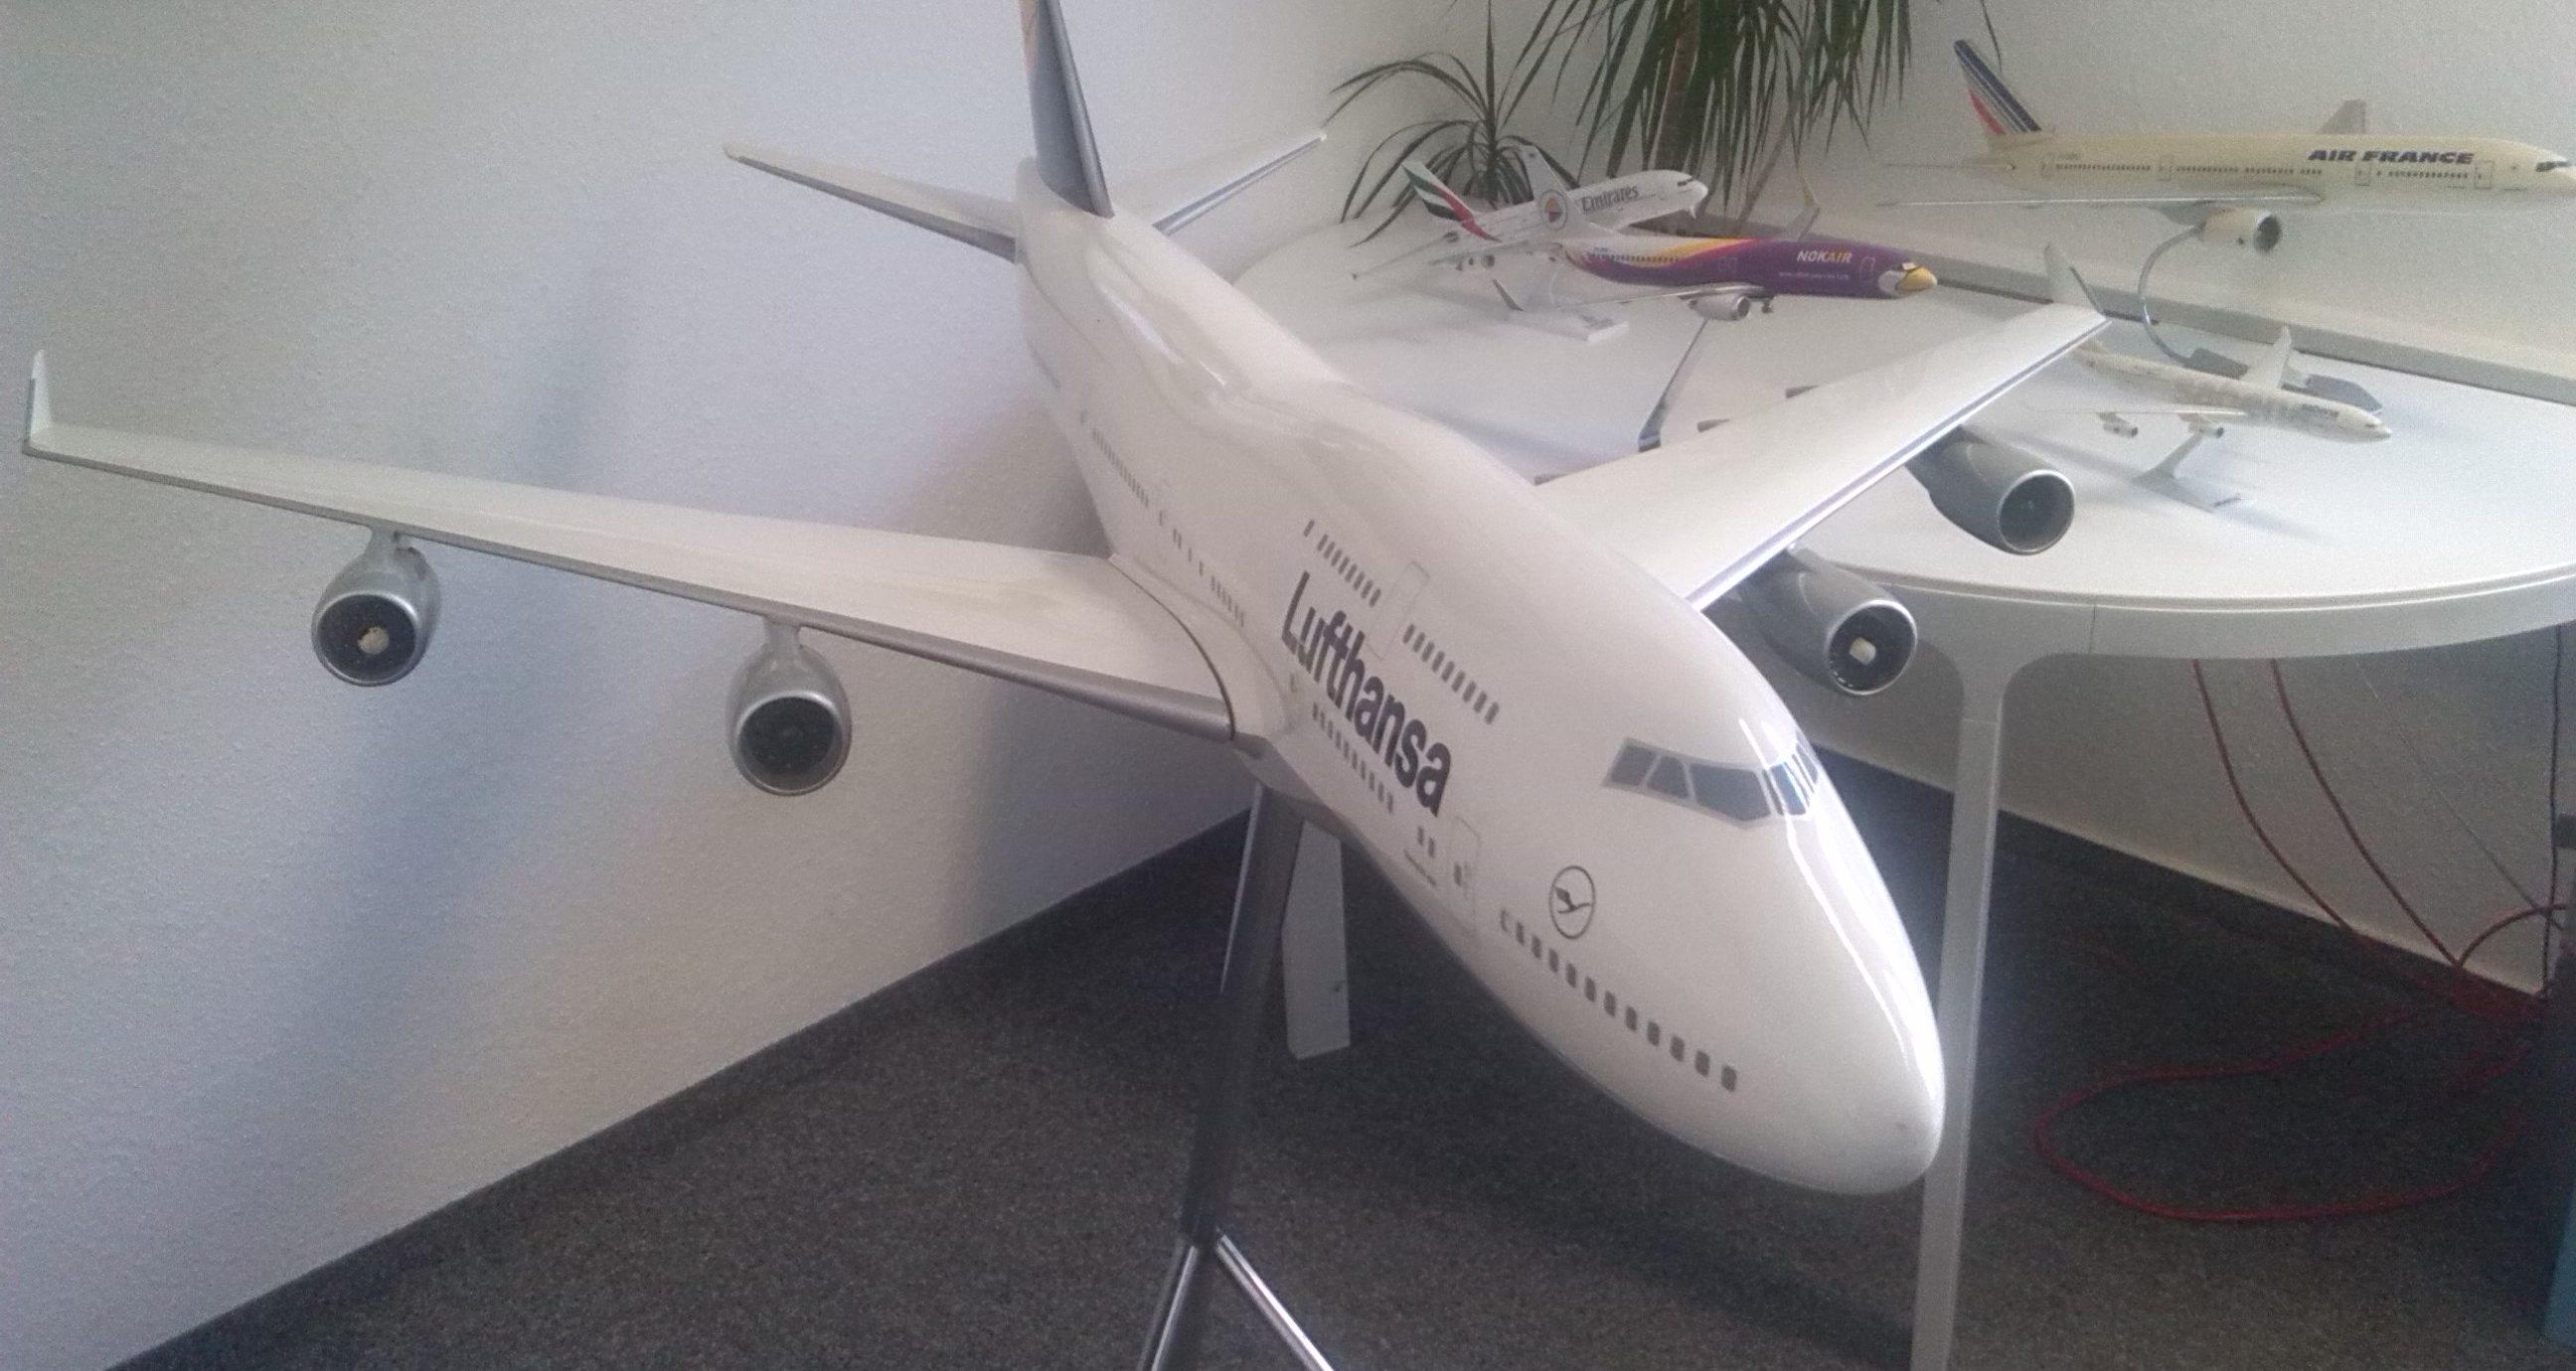 Flugzeugmodell Lufthansa Boing 747-400